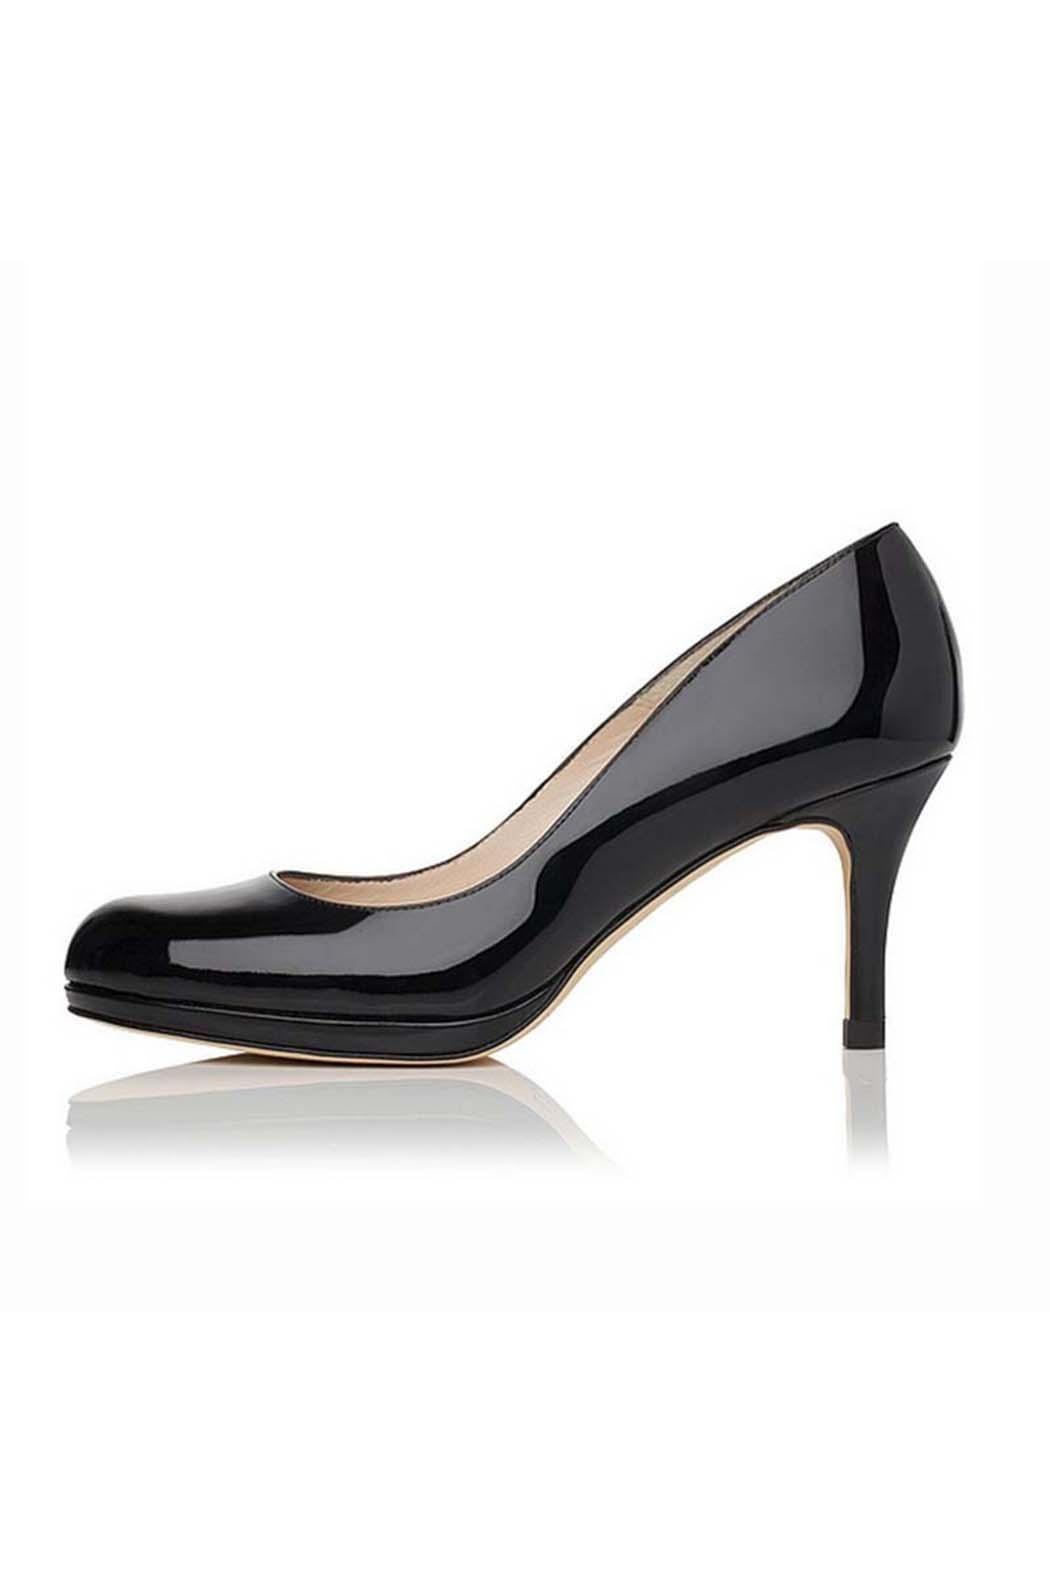 dc2749e276 LK BENNETT Sybila Black Patent Heel | What to Wear: Office Party ...